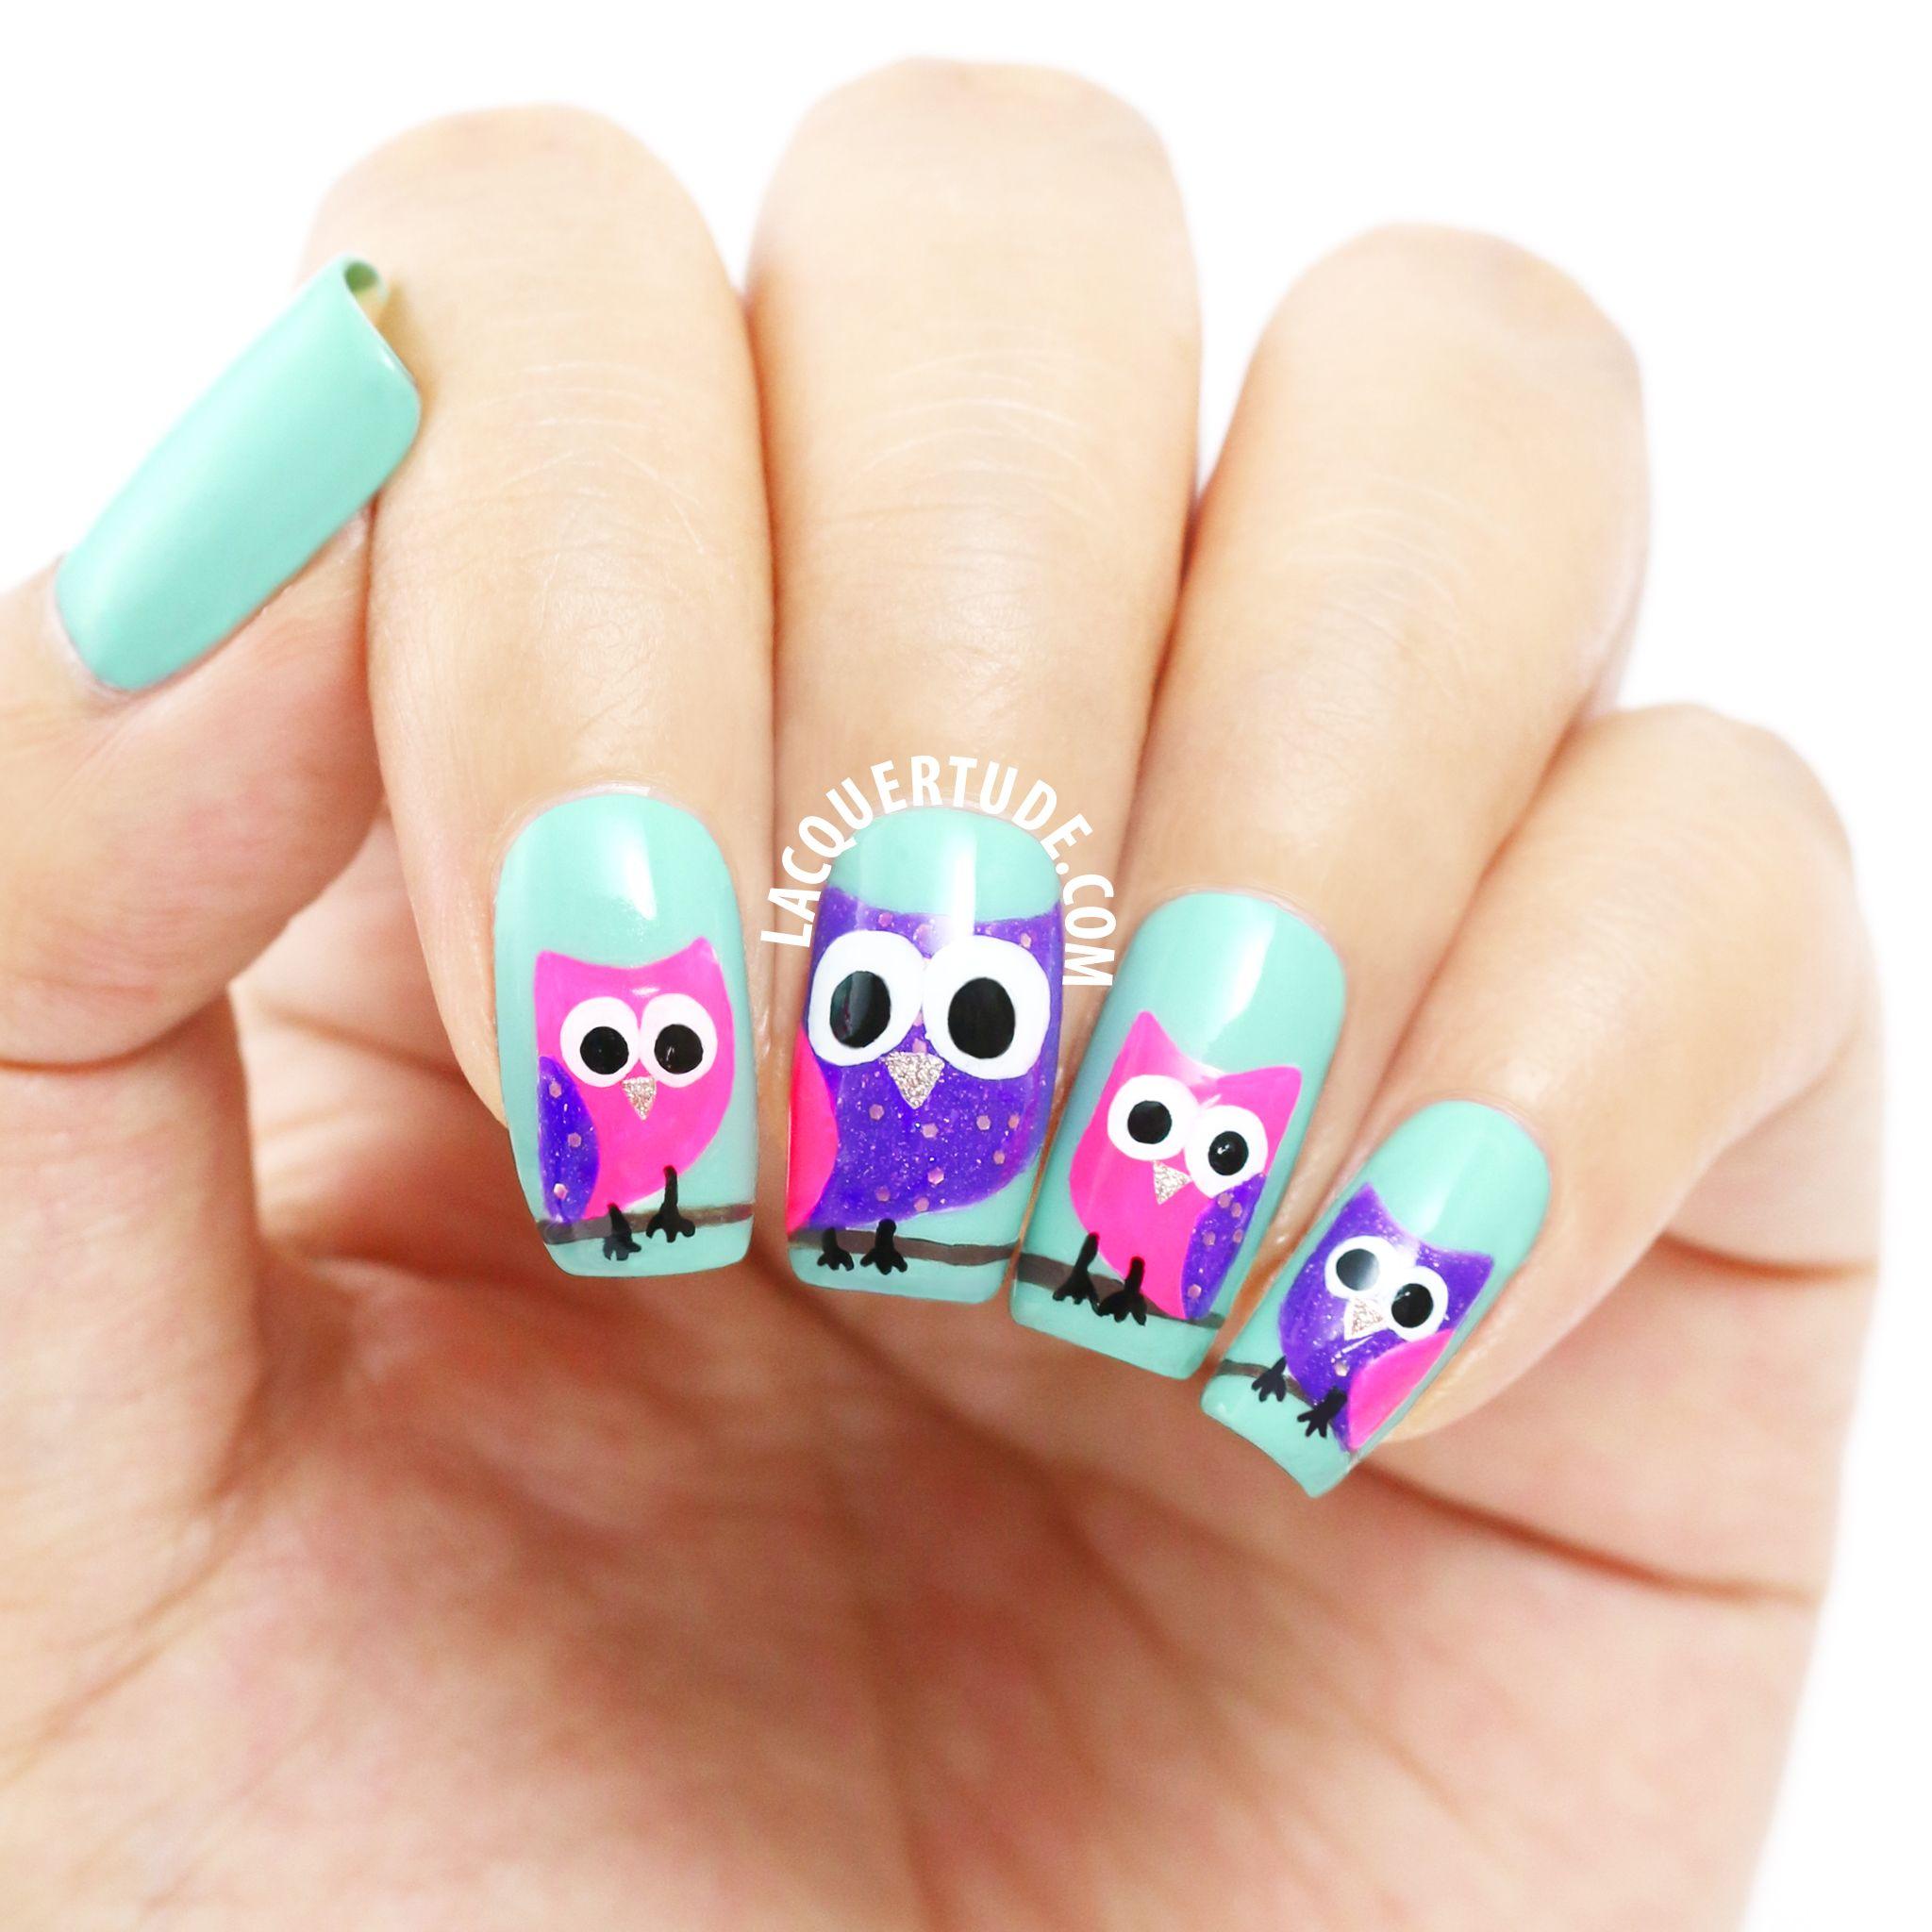 Lacquertude_PP Owl Nail Art | Nails | Pinterest | Owl nail art, Owl ...